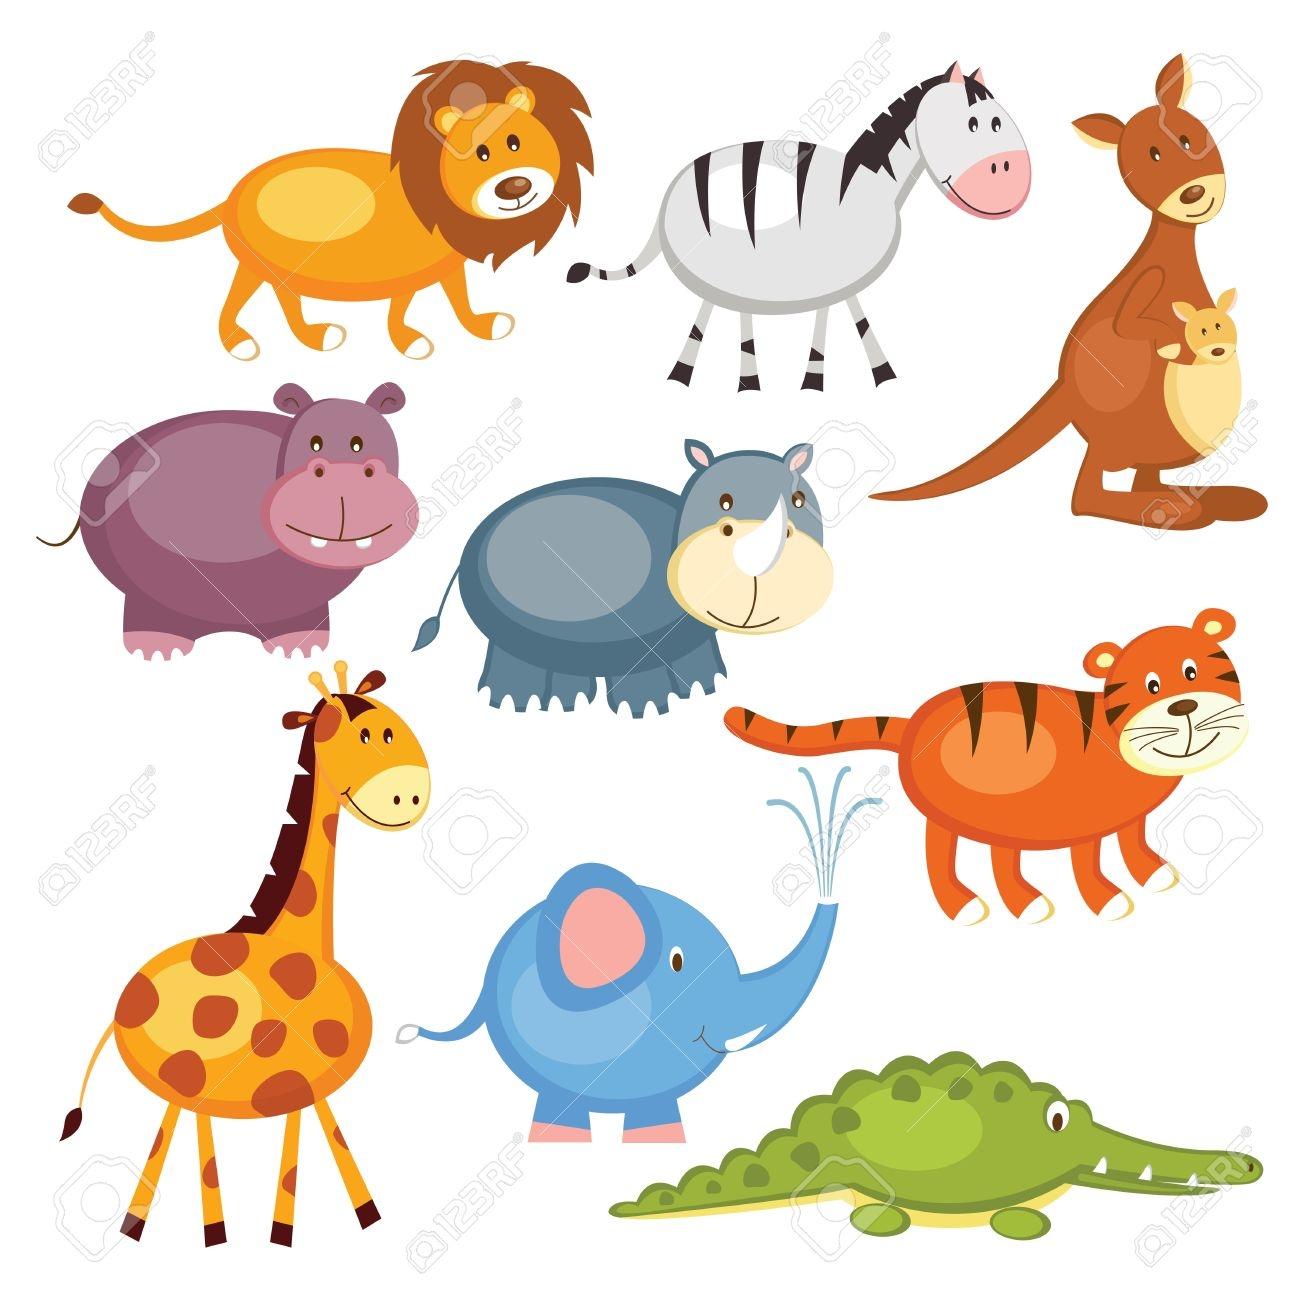 Wild Animal - Wild Animals Clipart